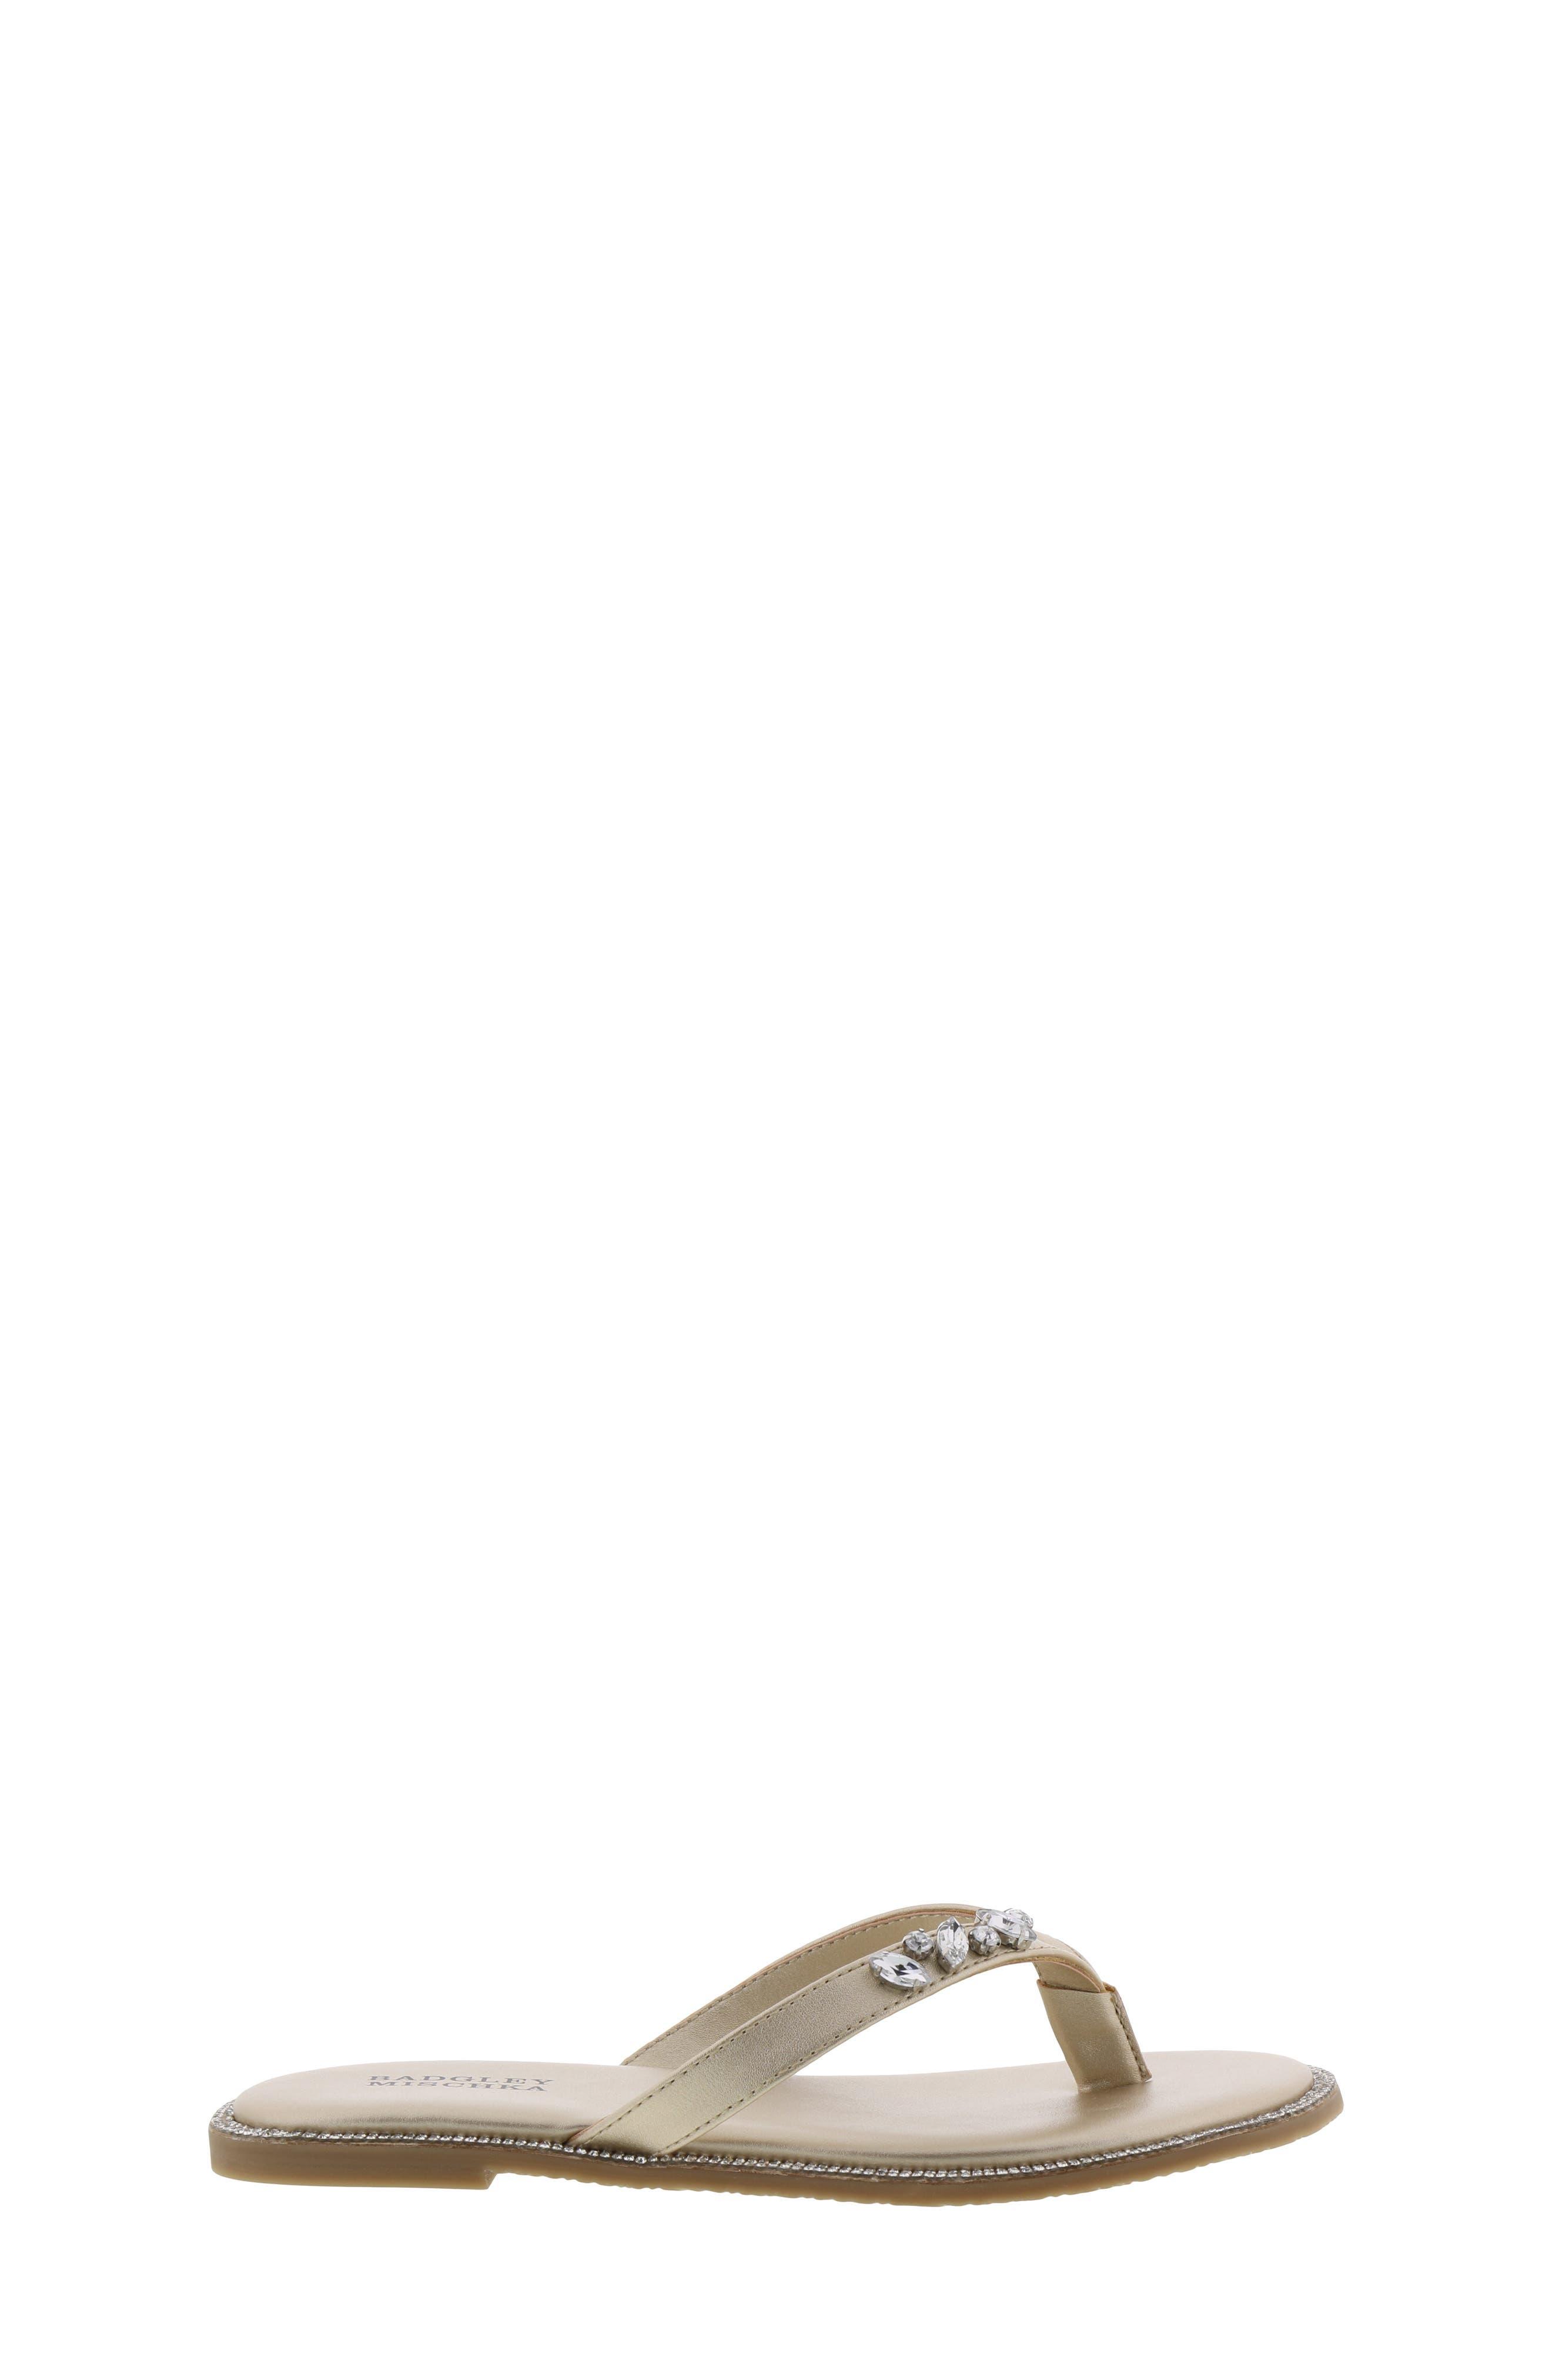 Badgley Mischka Missy Flip Flop,                             Alternate thumbnail 3, color,                             LIGHT GOLD SHIMMER